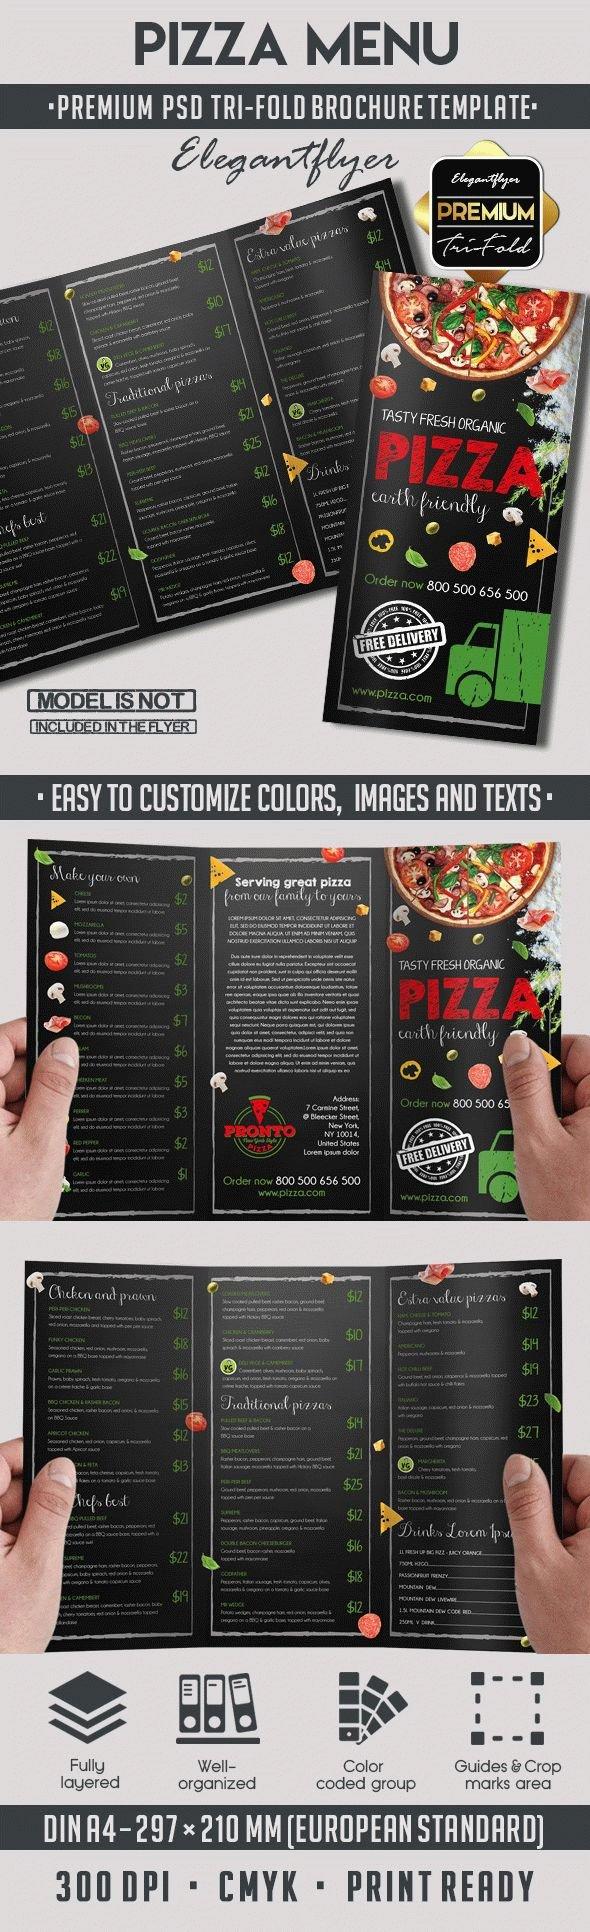 Tri Fold Menu Templates Pizza Menu Design Tri Fold Brochure Template – by Elegantflyer